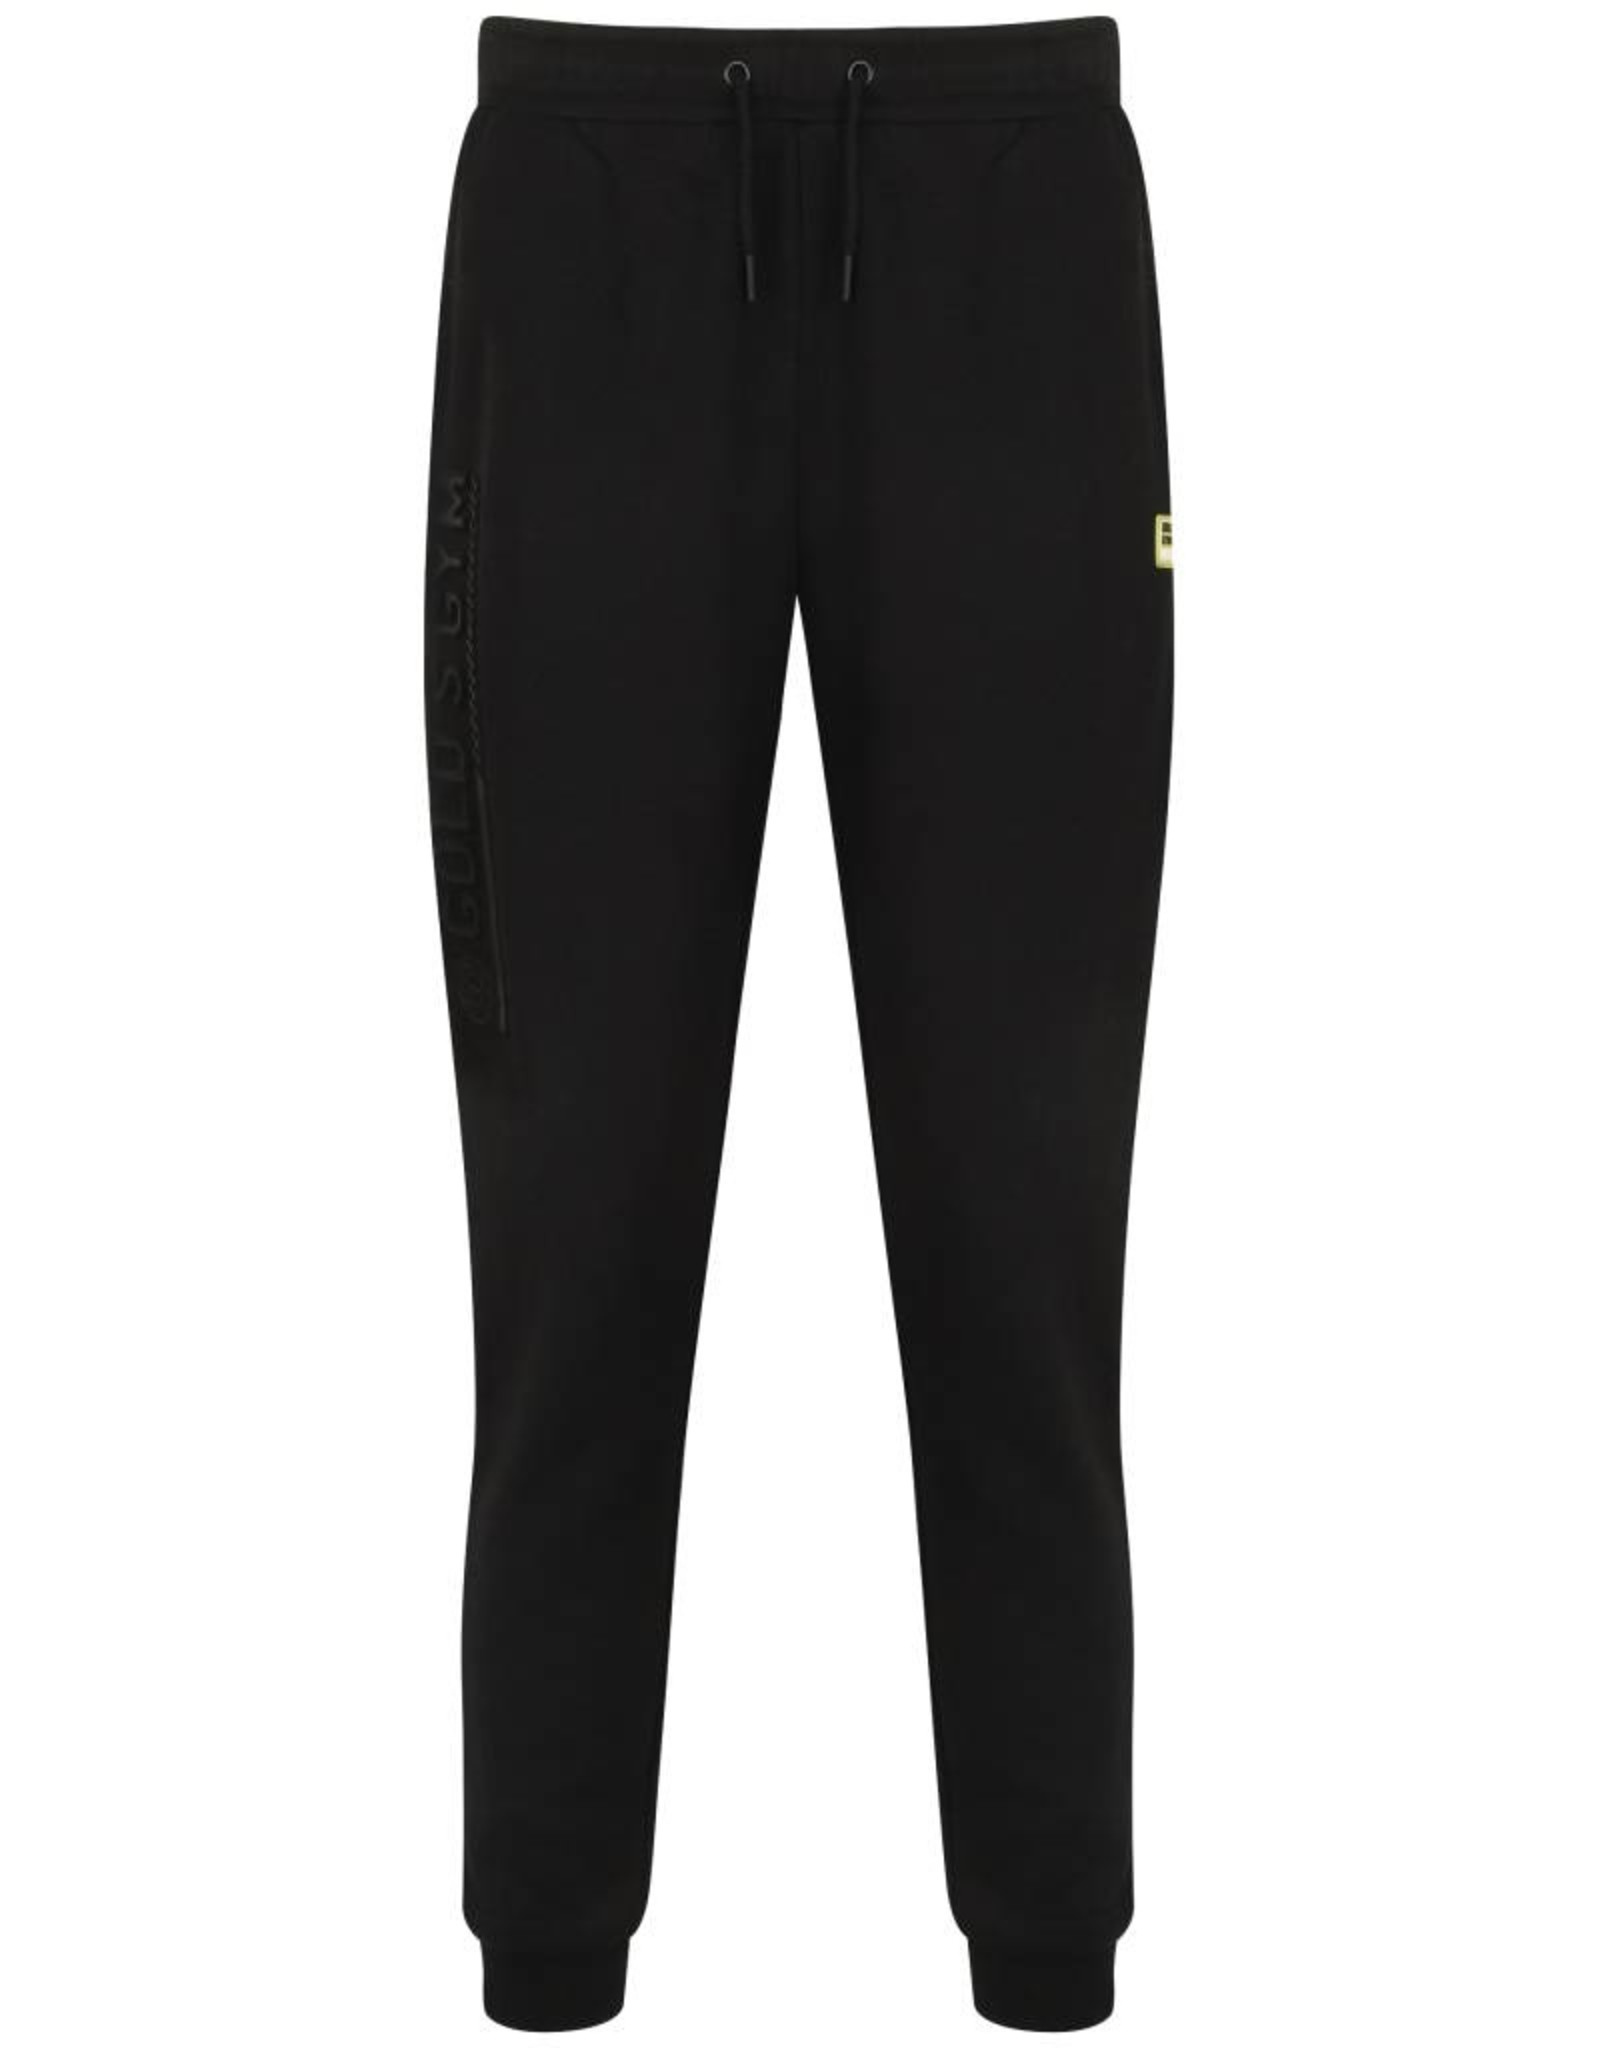 Gold's Gym Jog Pants with Embossed Print - Zwart